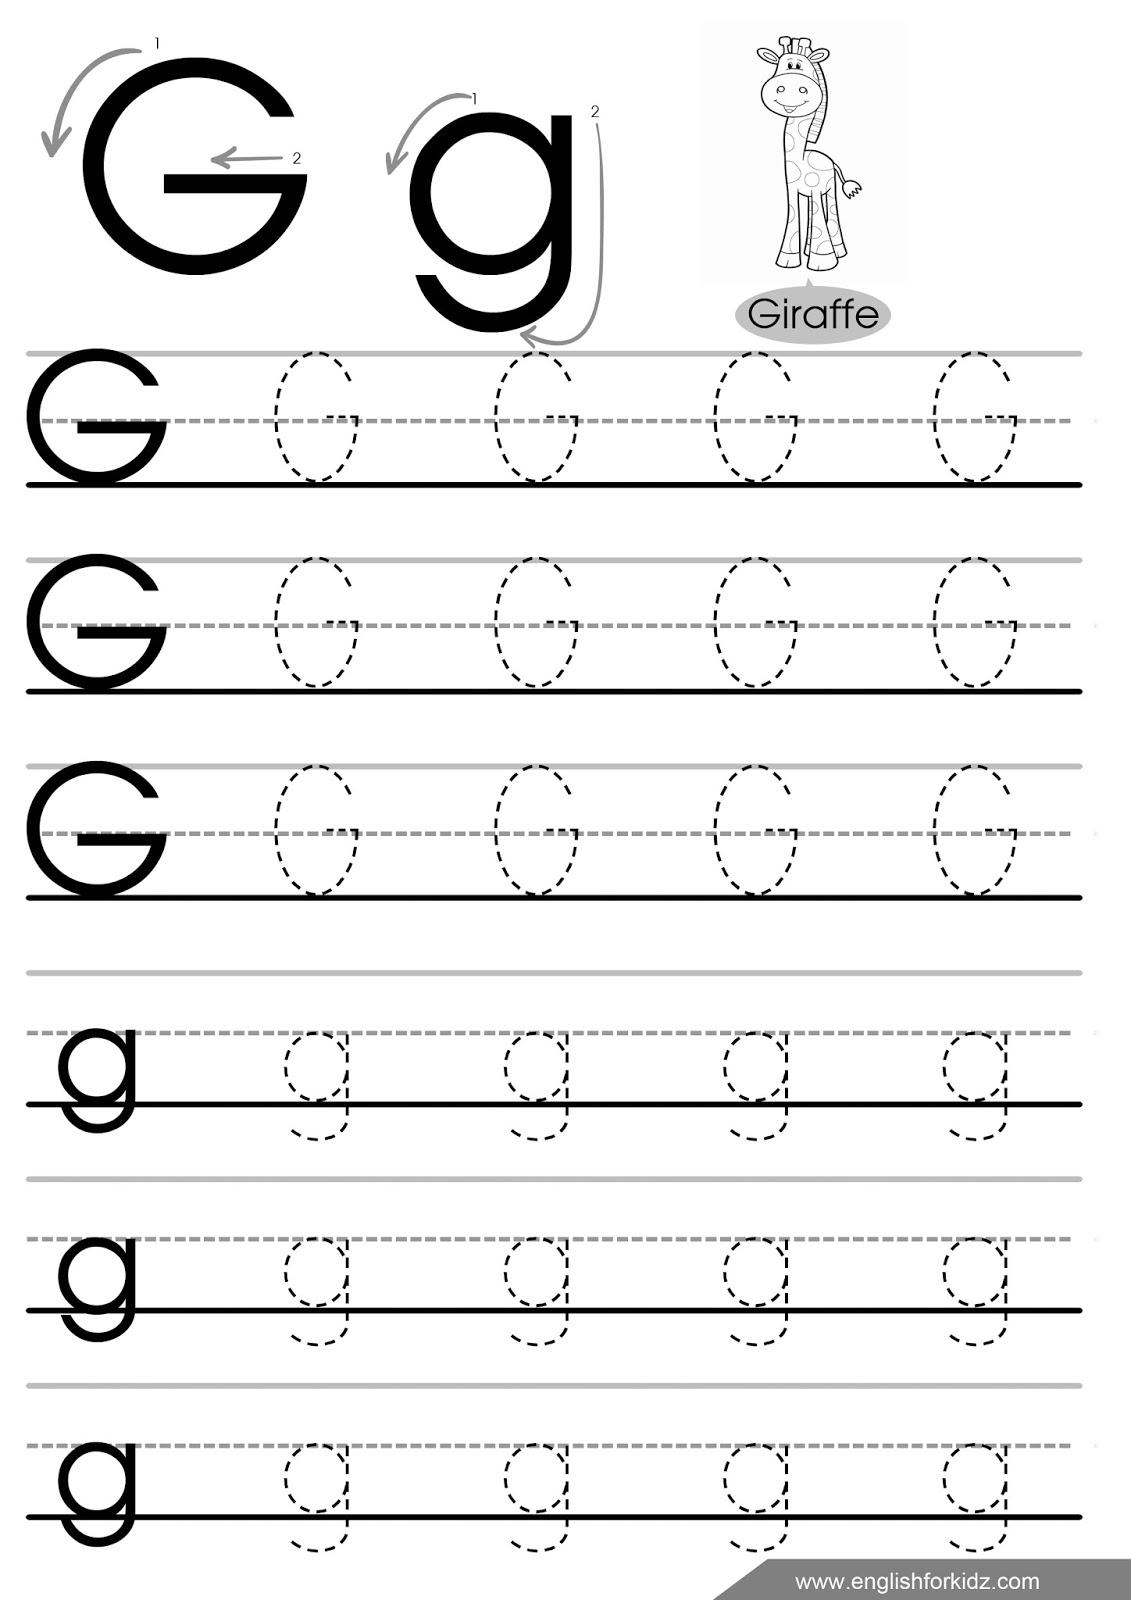 Letter G Worksheets, Flash Cards, Coloring Pages regarding Letter G Tracing Printable